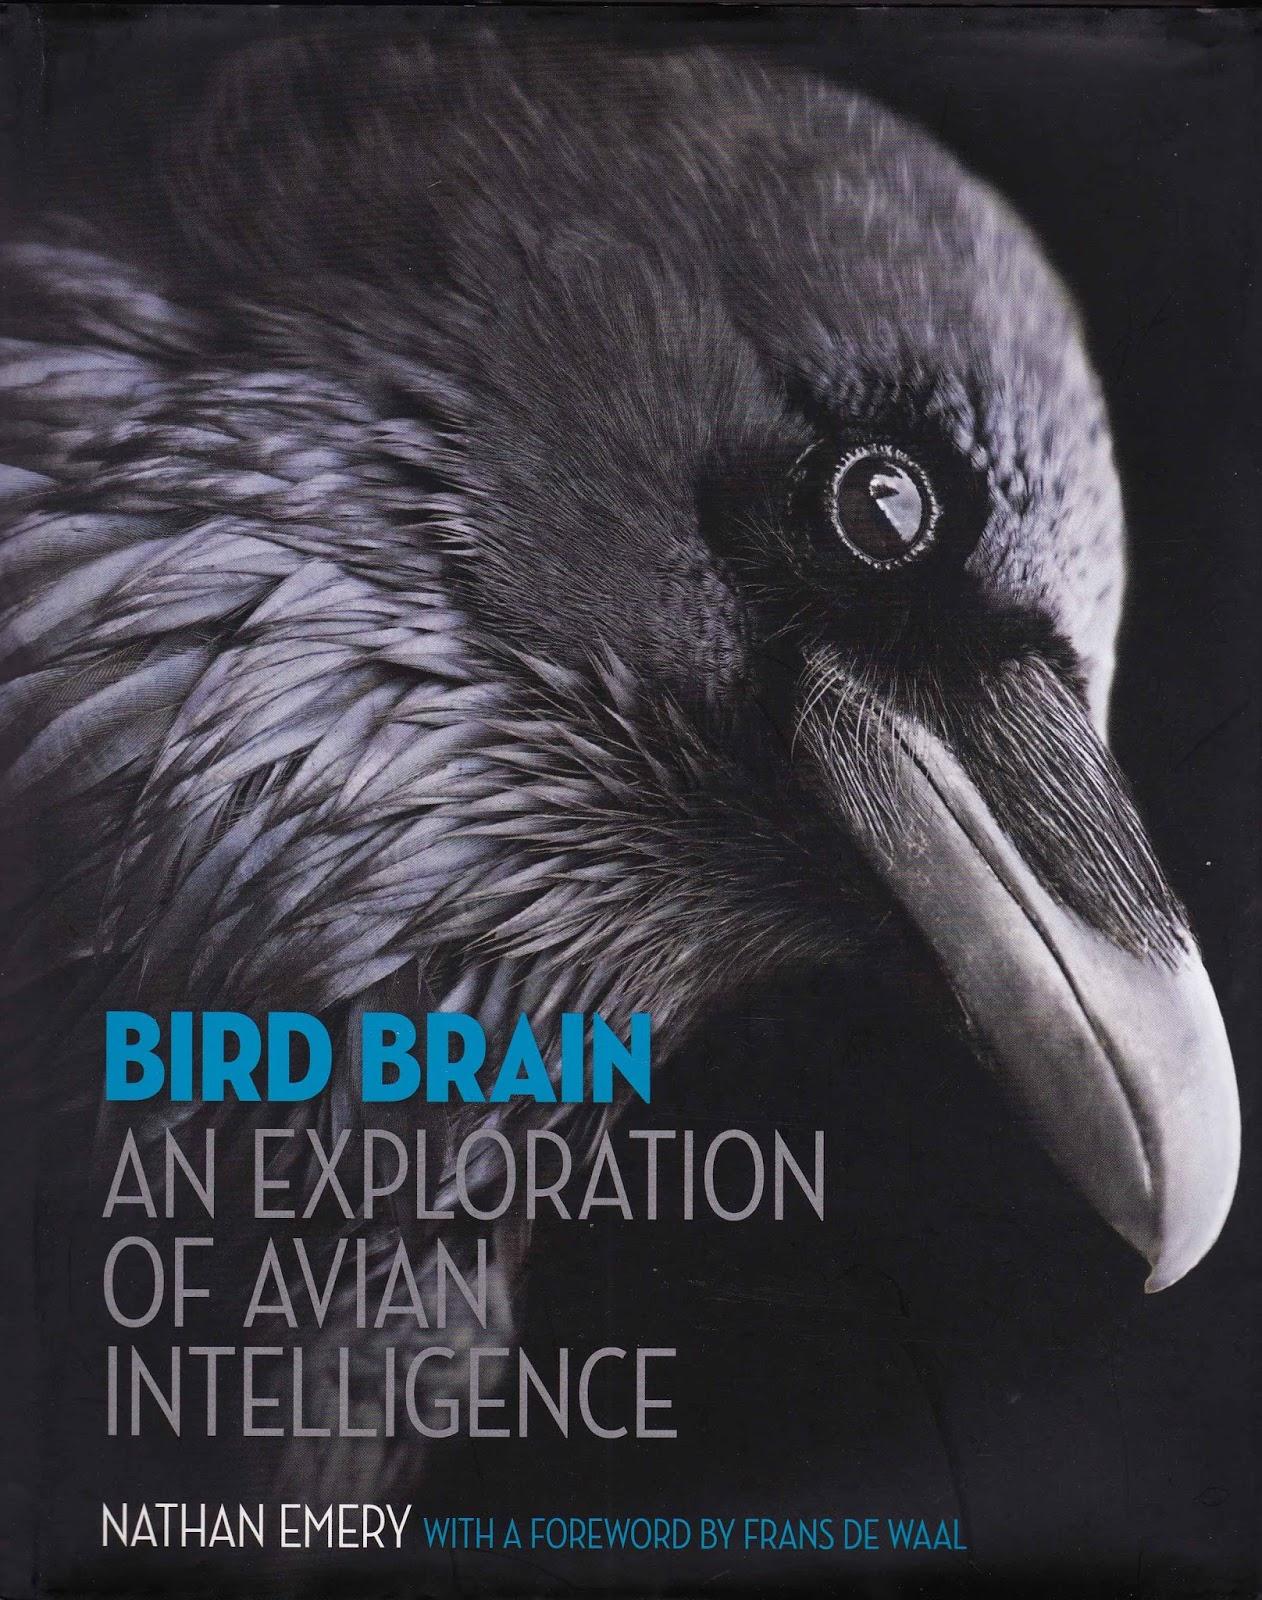 How birds think: What Birds belong in the \